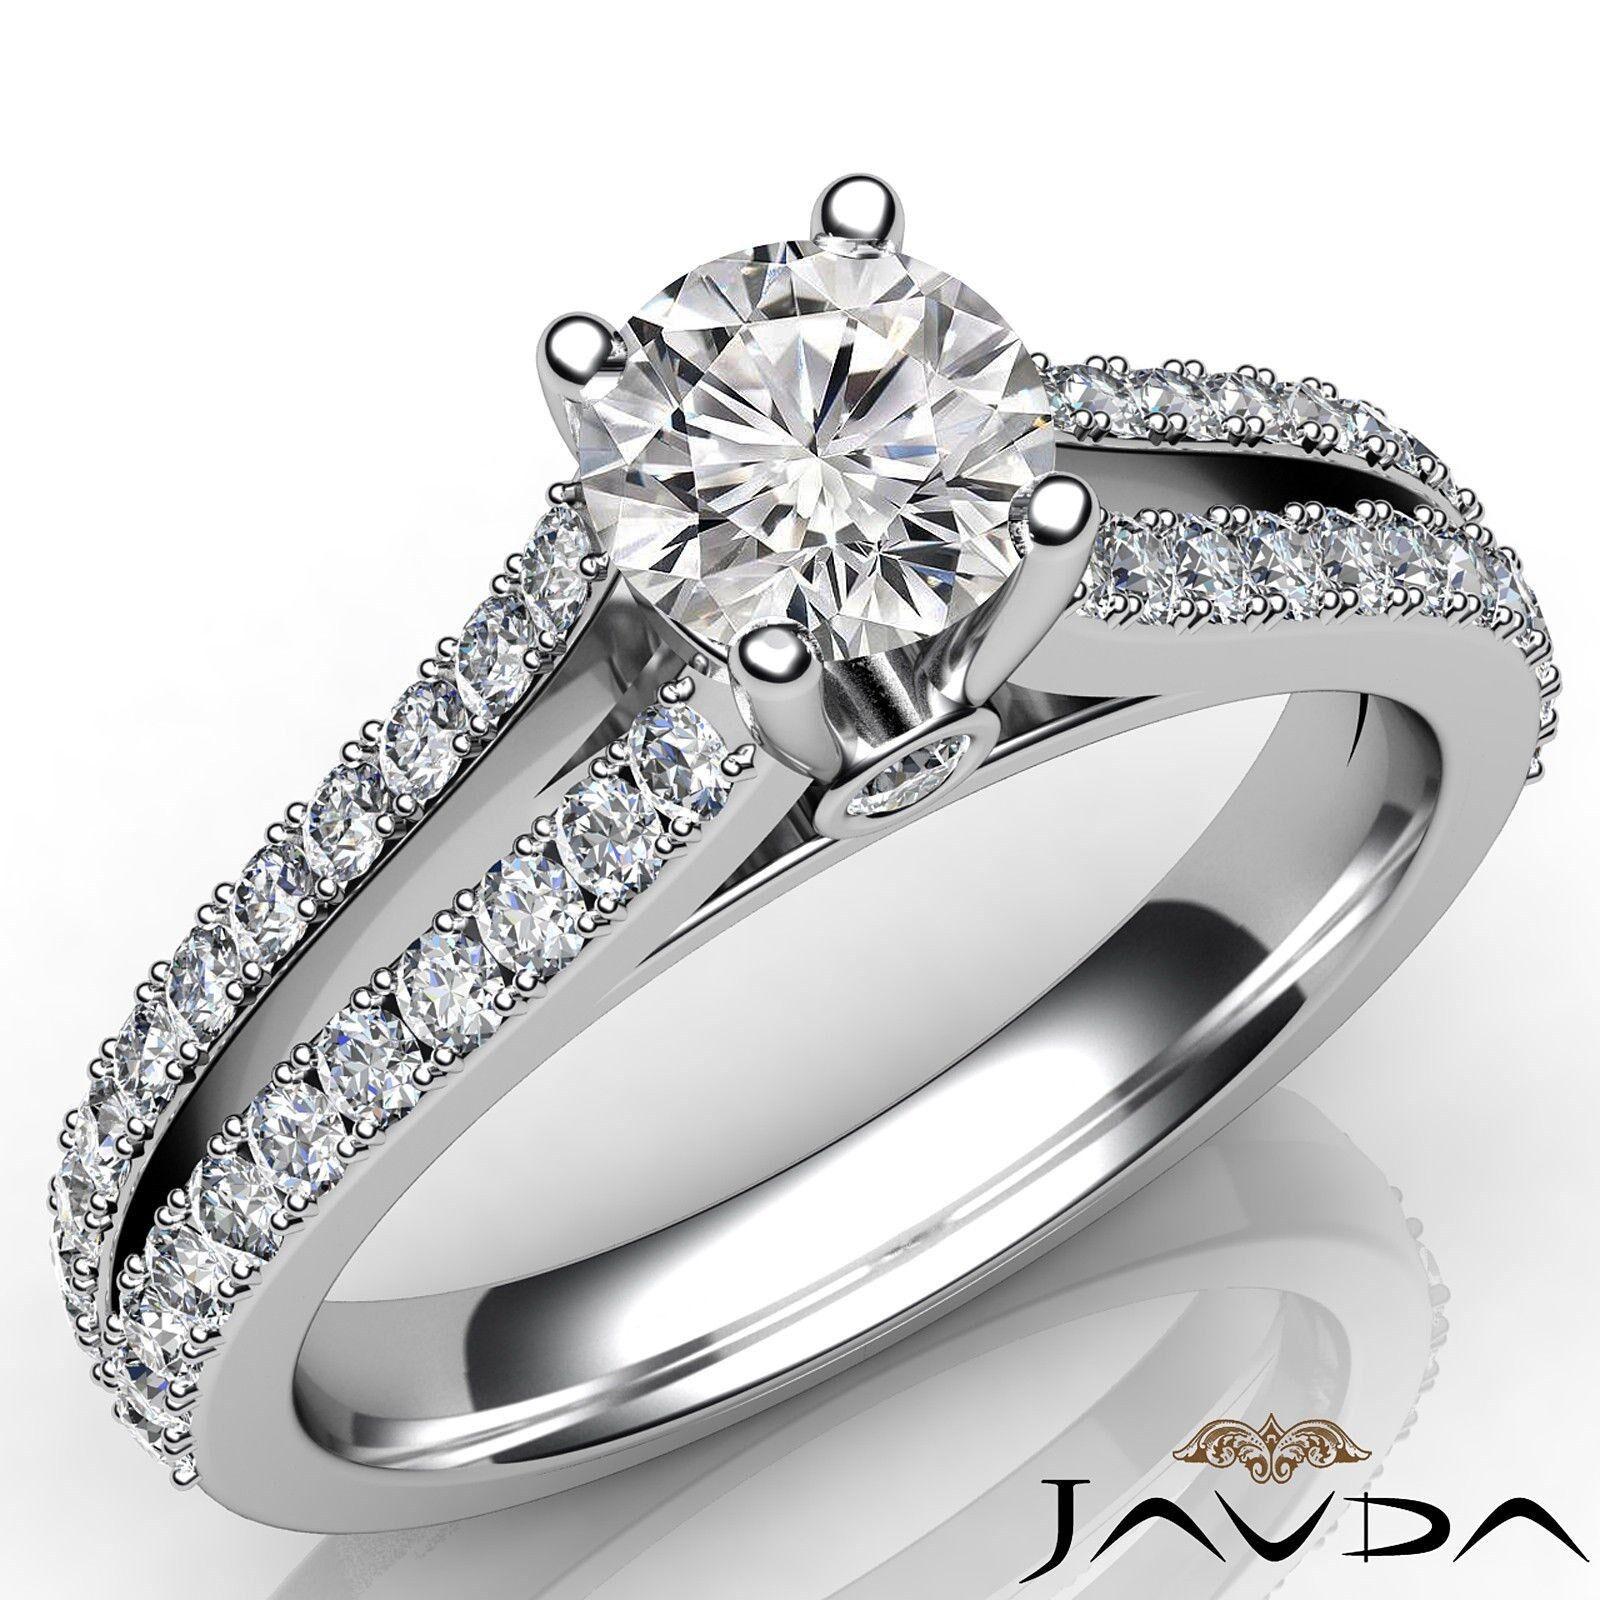 Split Shank French V Pave Round Diamond Engagement Bezel Ring GIA D VS1 1.15 Ct